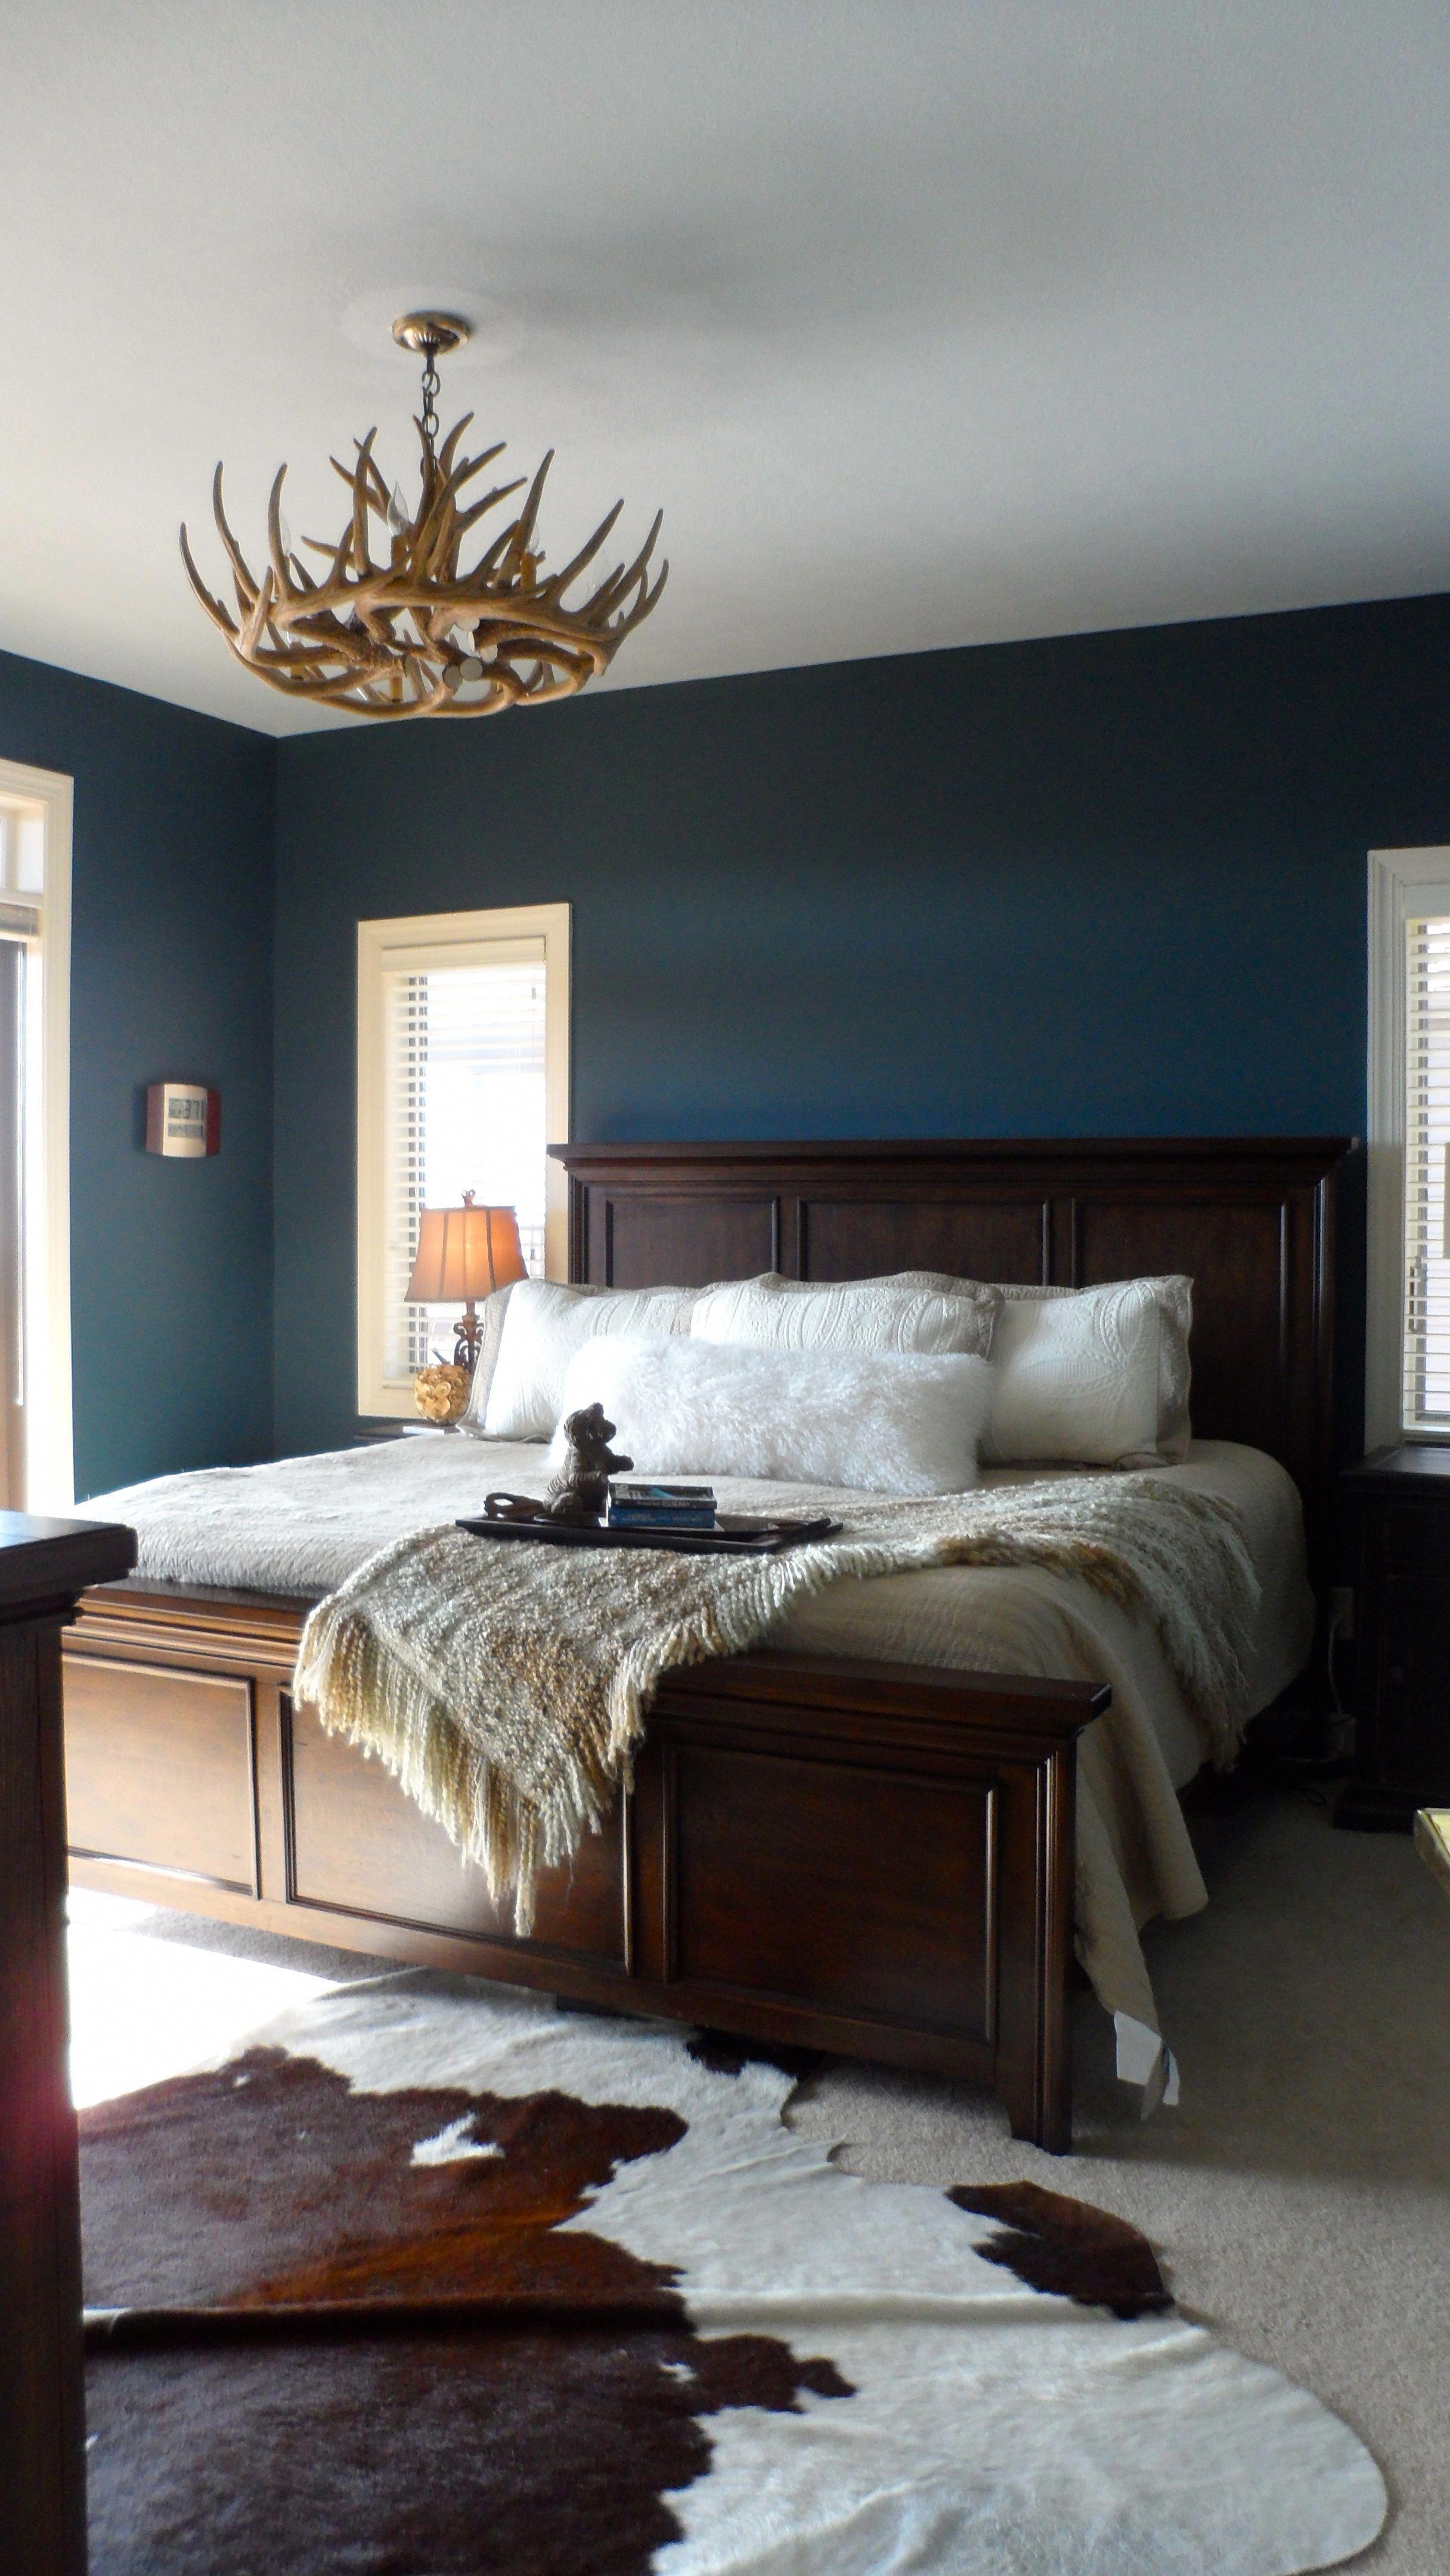 Cowhide Rug Chandelier Modernhomedecorbedroom Blue Master Bedroom Master Bedrooms Decor Blue Bedroom Walls